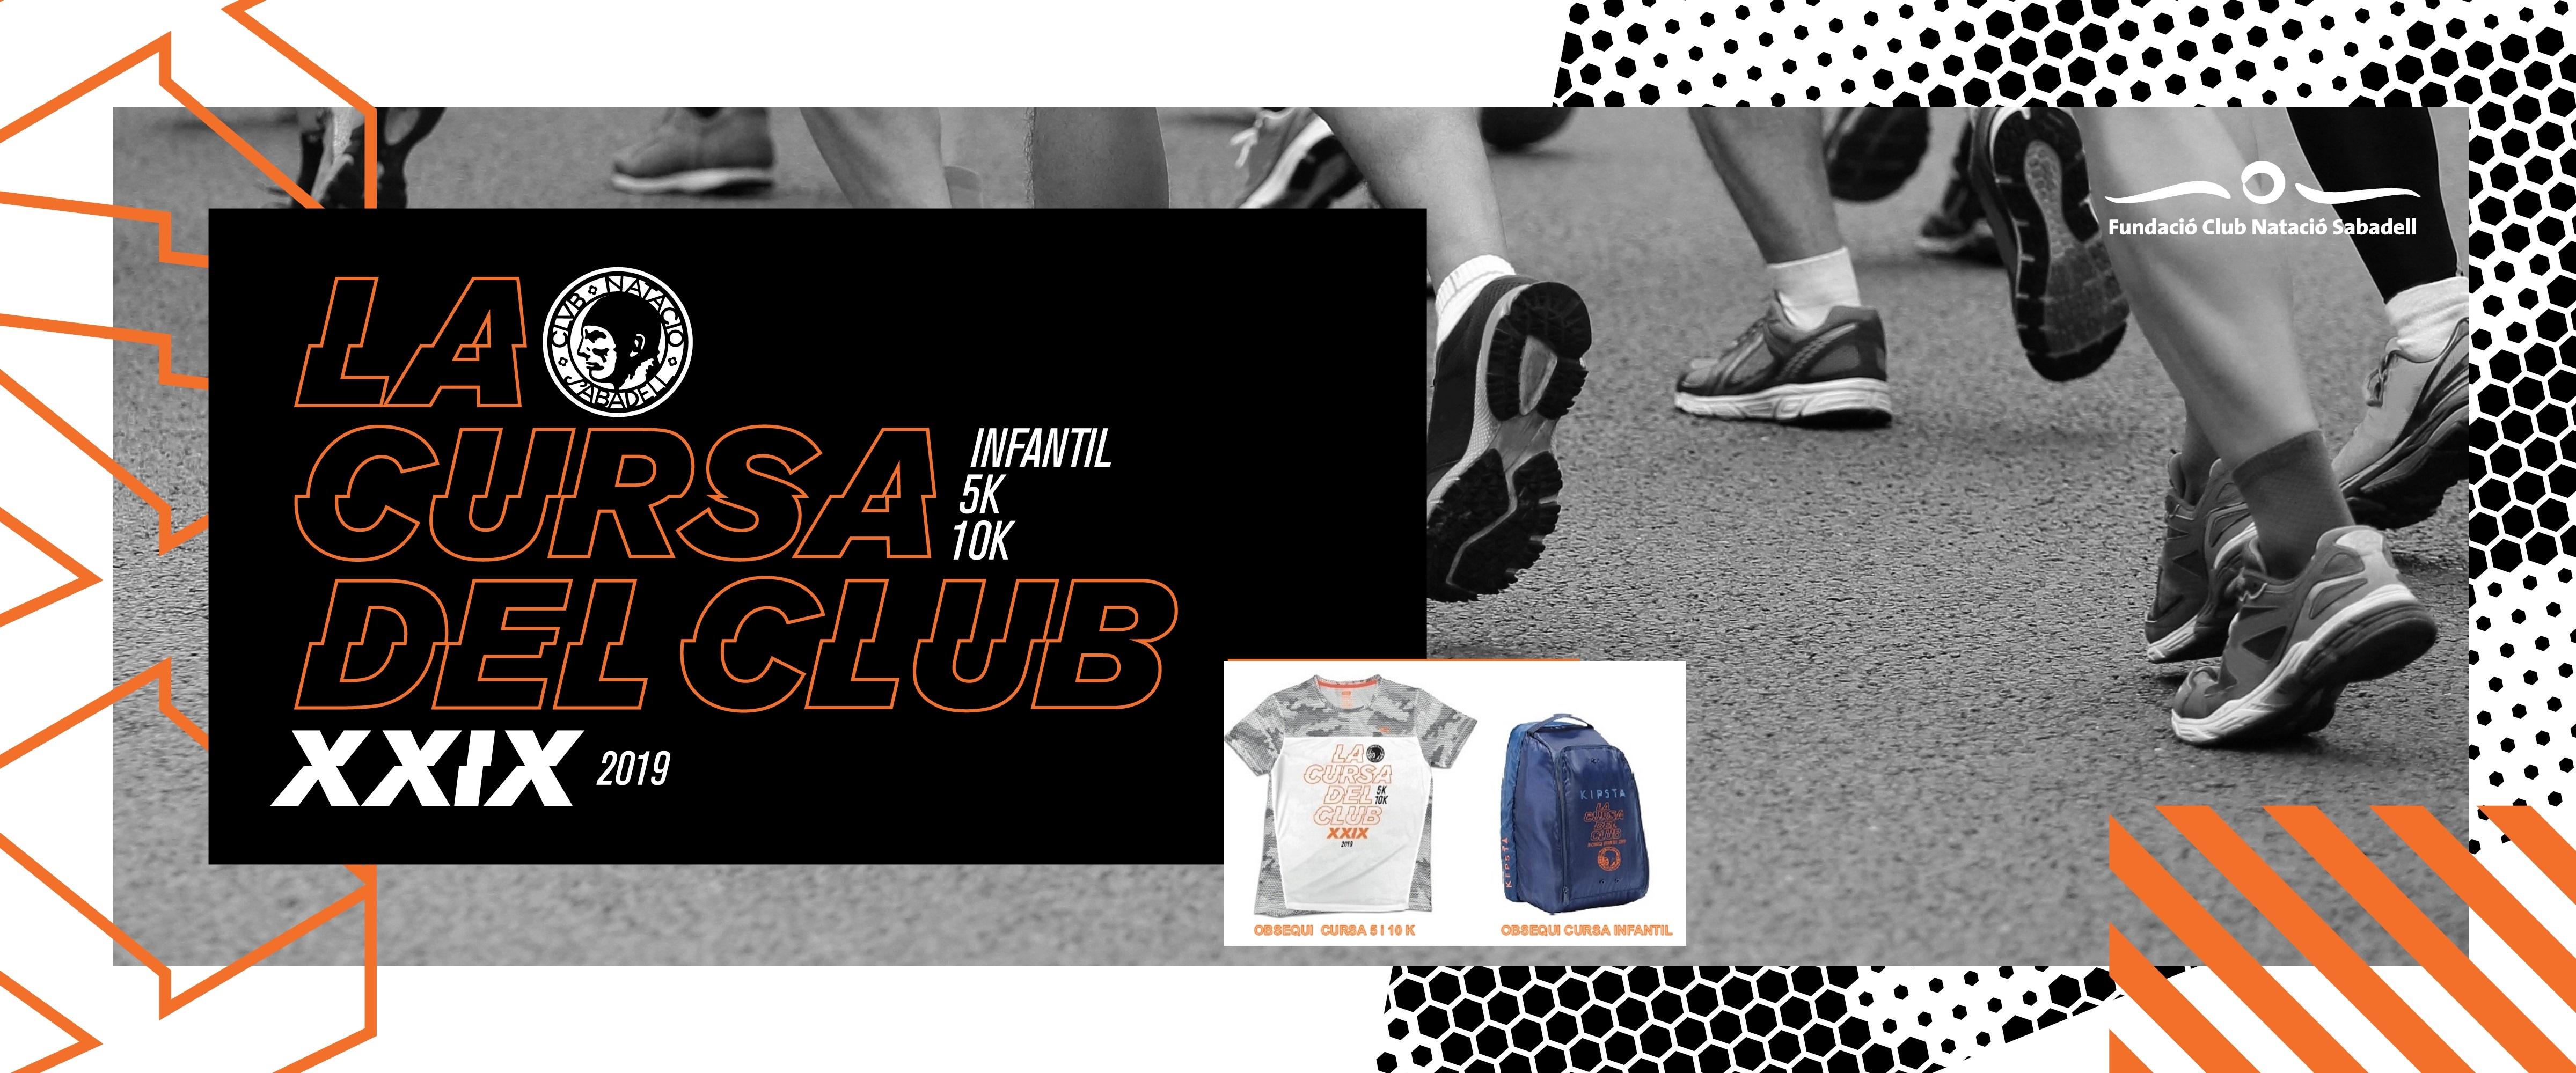 XXIX Cursa Club Natació Sabadell 5km i 10km